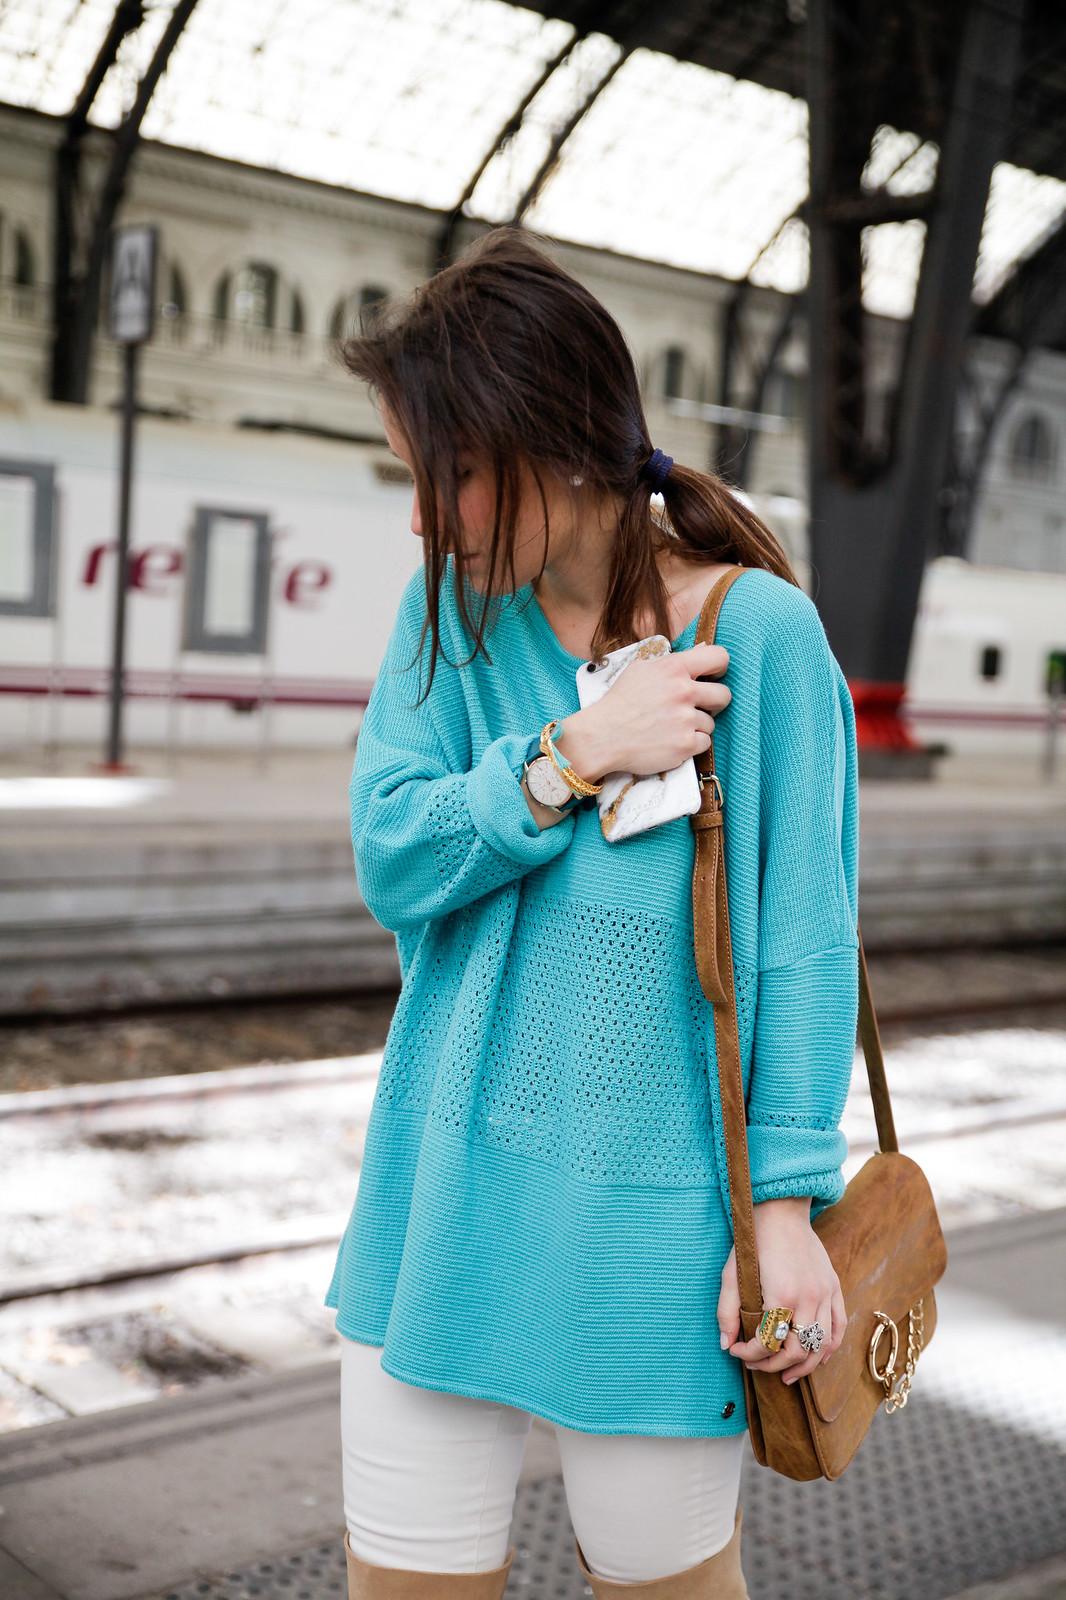 08_como_combinar_la_ropa_verde_turquesa_ideas_look_street_style_theguestgirl_ruga_boots_fringes_barcelona_influencer_top_blogger